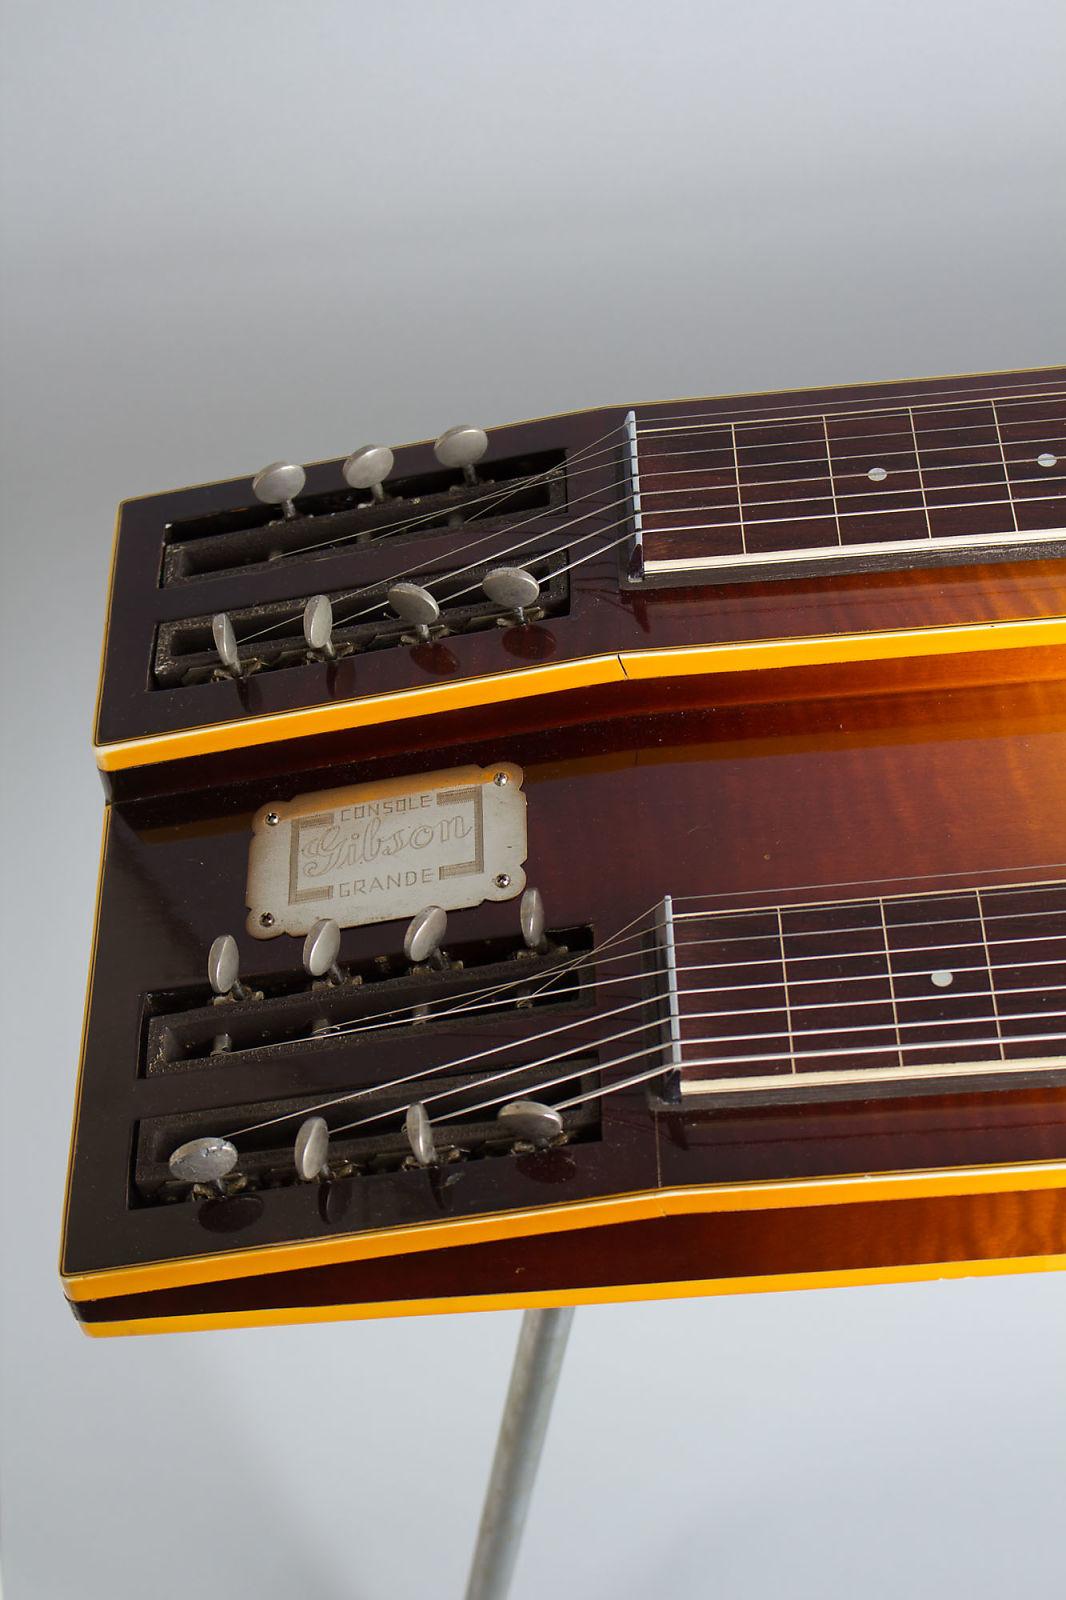 Gibson  Console Grand High Steel Electric Guitar (1940), ser. #F1552-6, original tweed hard shell case.